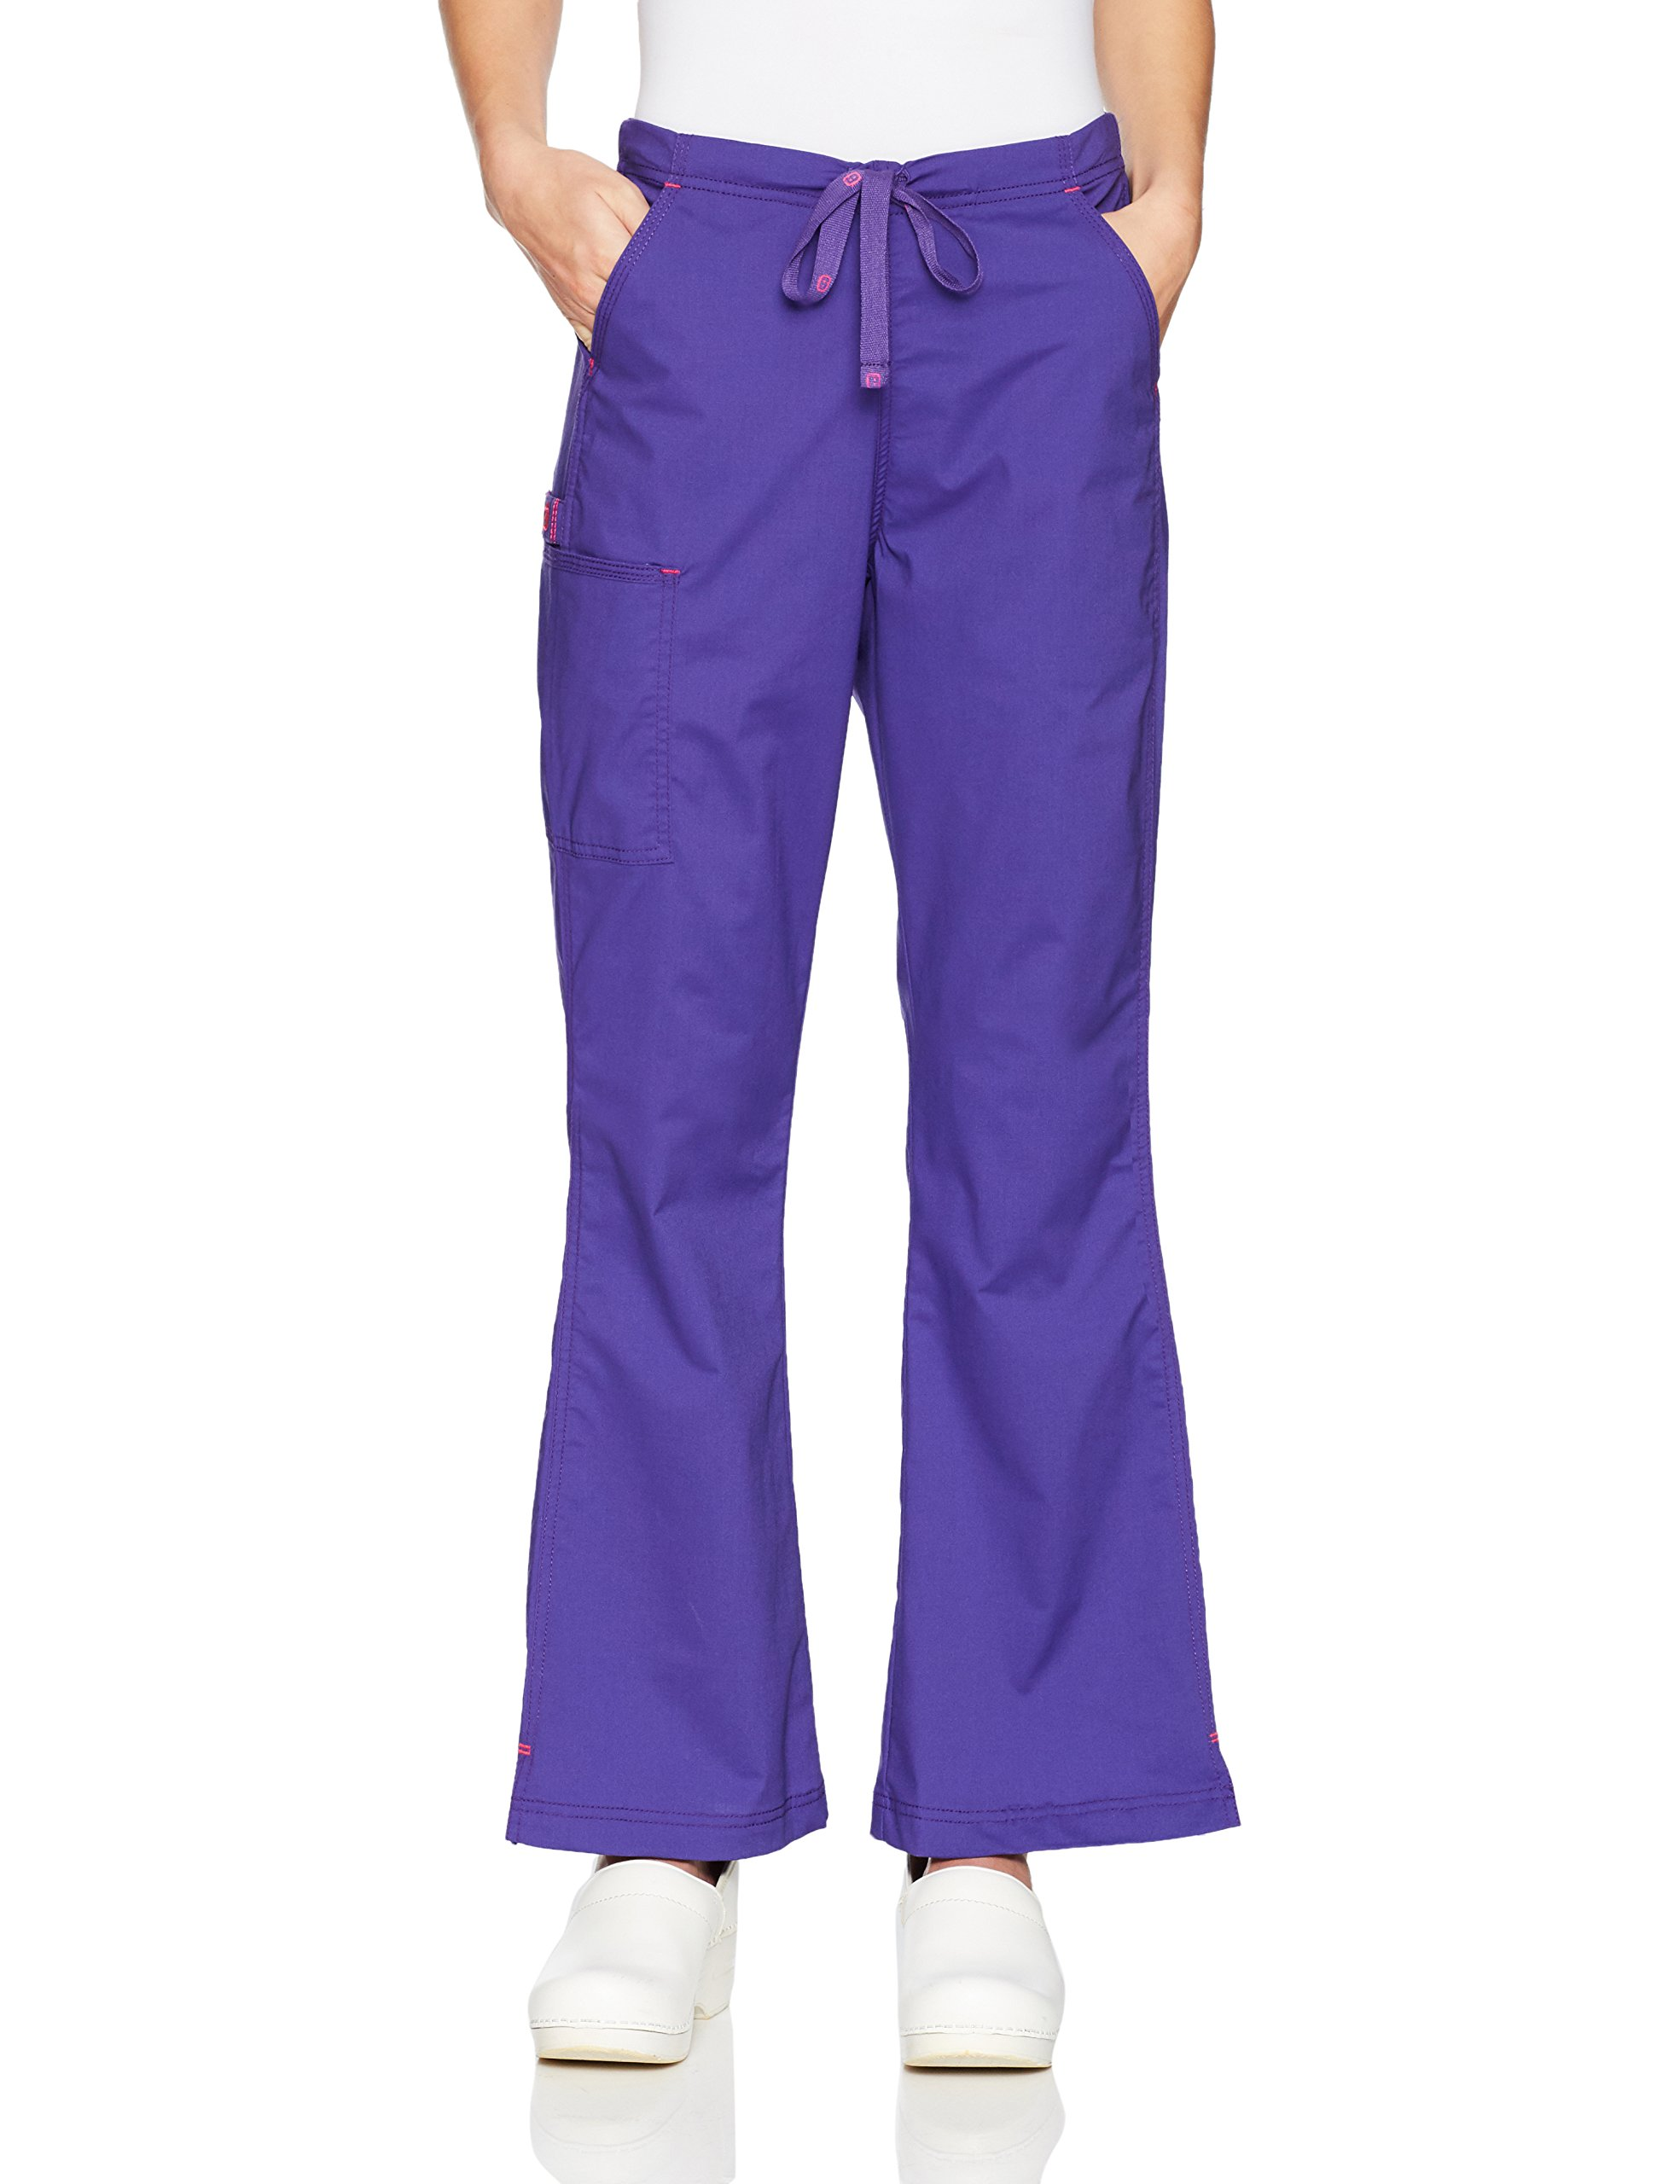 WonderWink Women's Size Grace-Flare Leg Cargo Pant, Grape, Extra Large Tall